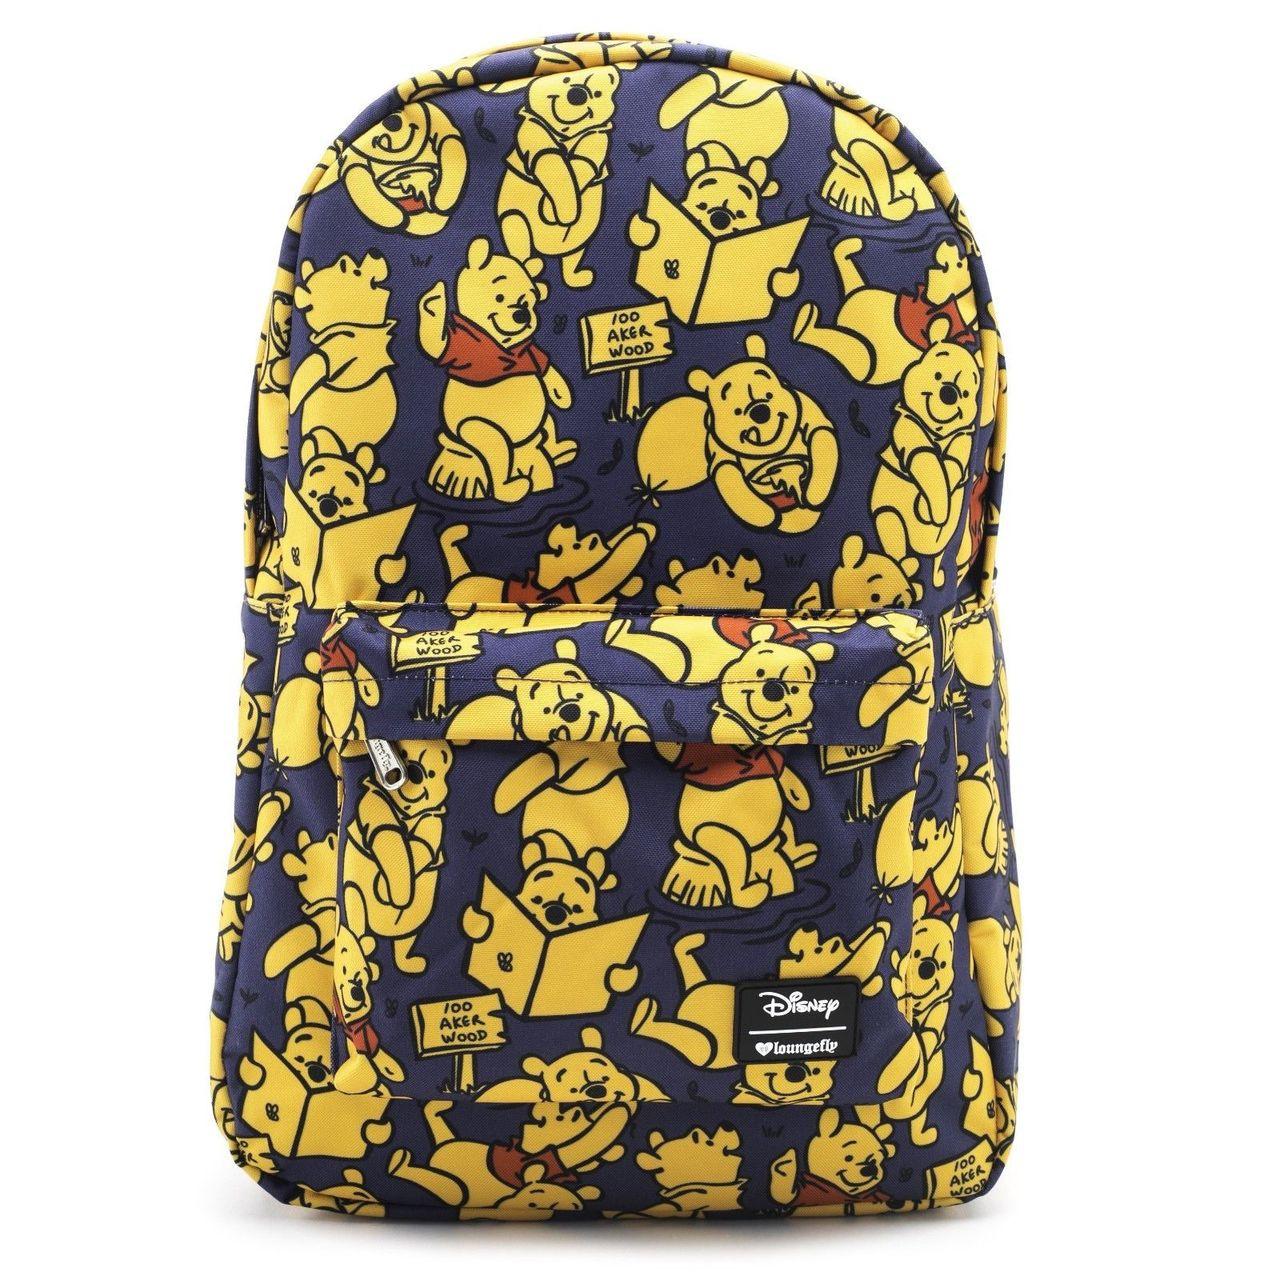 9686cb875 Loungefly Disney Winnie the Pooh Bear Print School Book Bag Backpack  WDBK0507 - Fearless Apparel